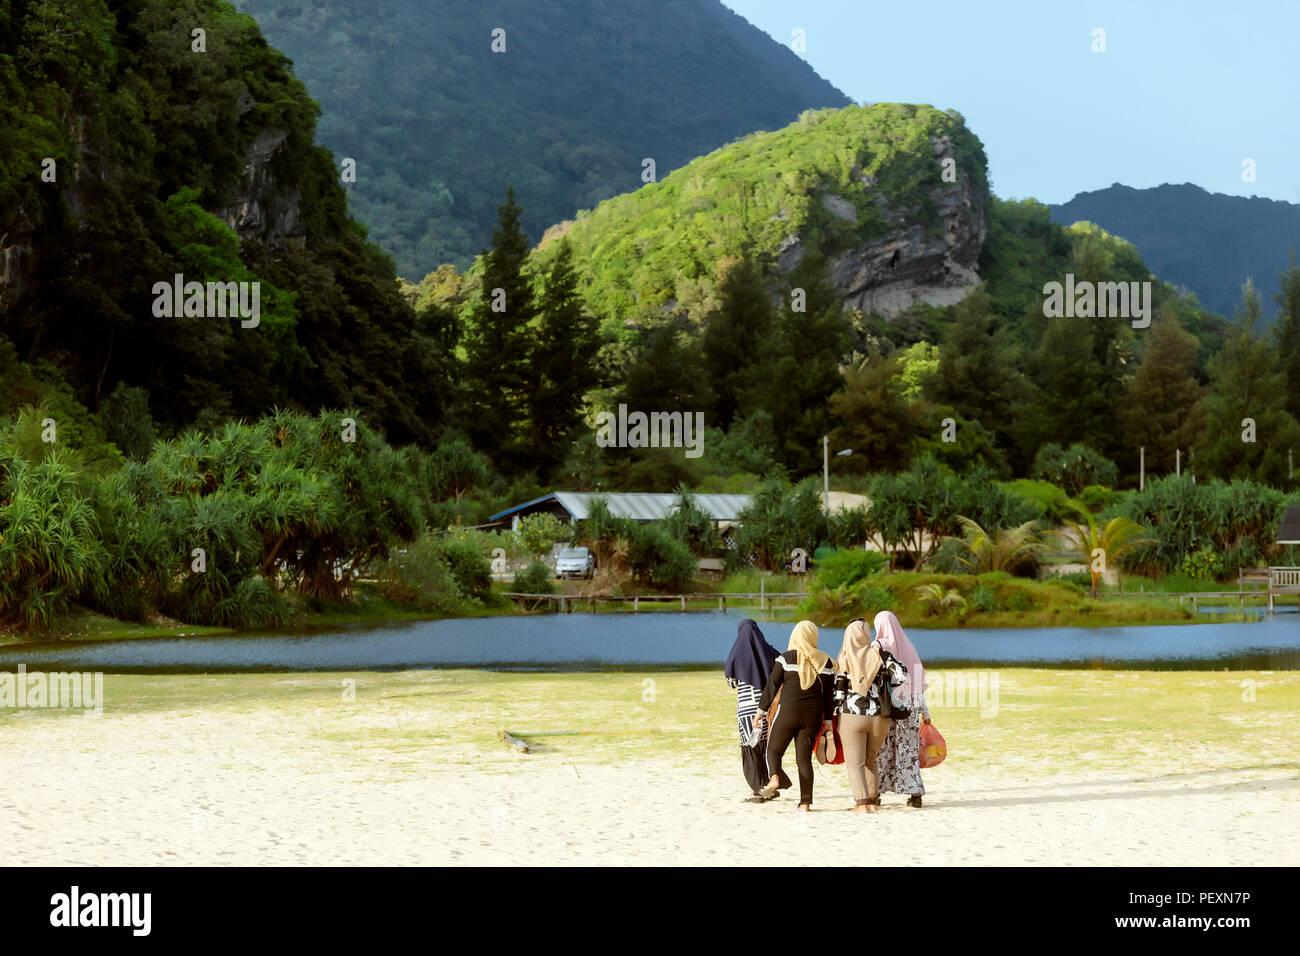 Women in hijabs walking on lakeshore, Banda Aceh, Sumatra, Indonesia - Stock Image